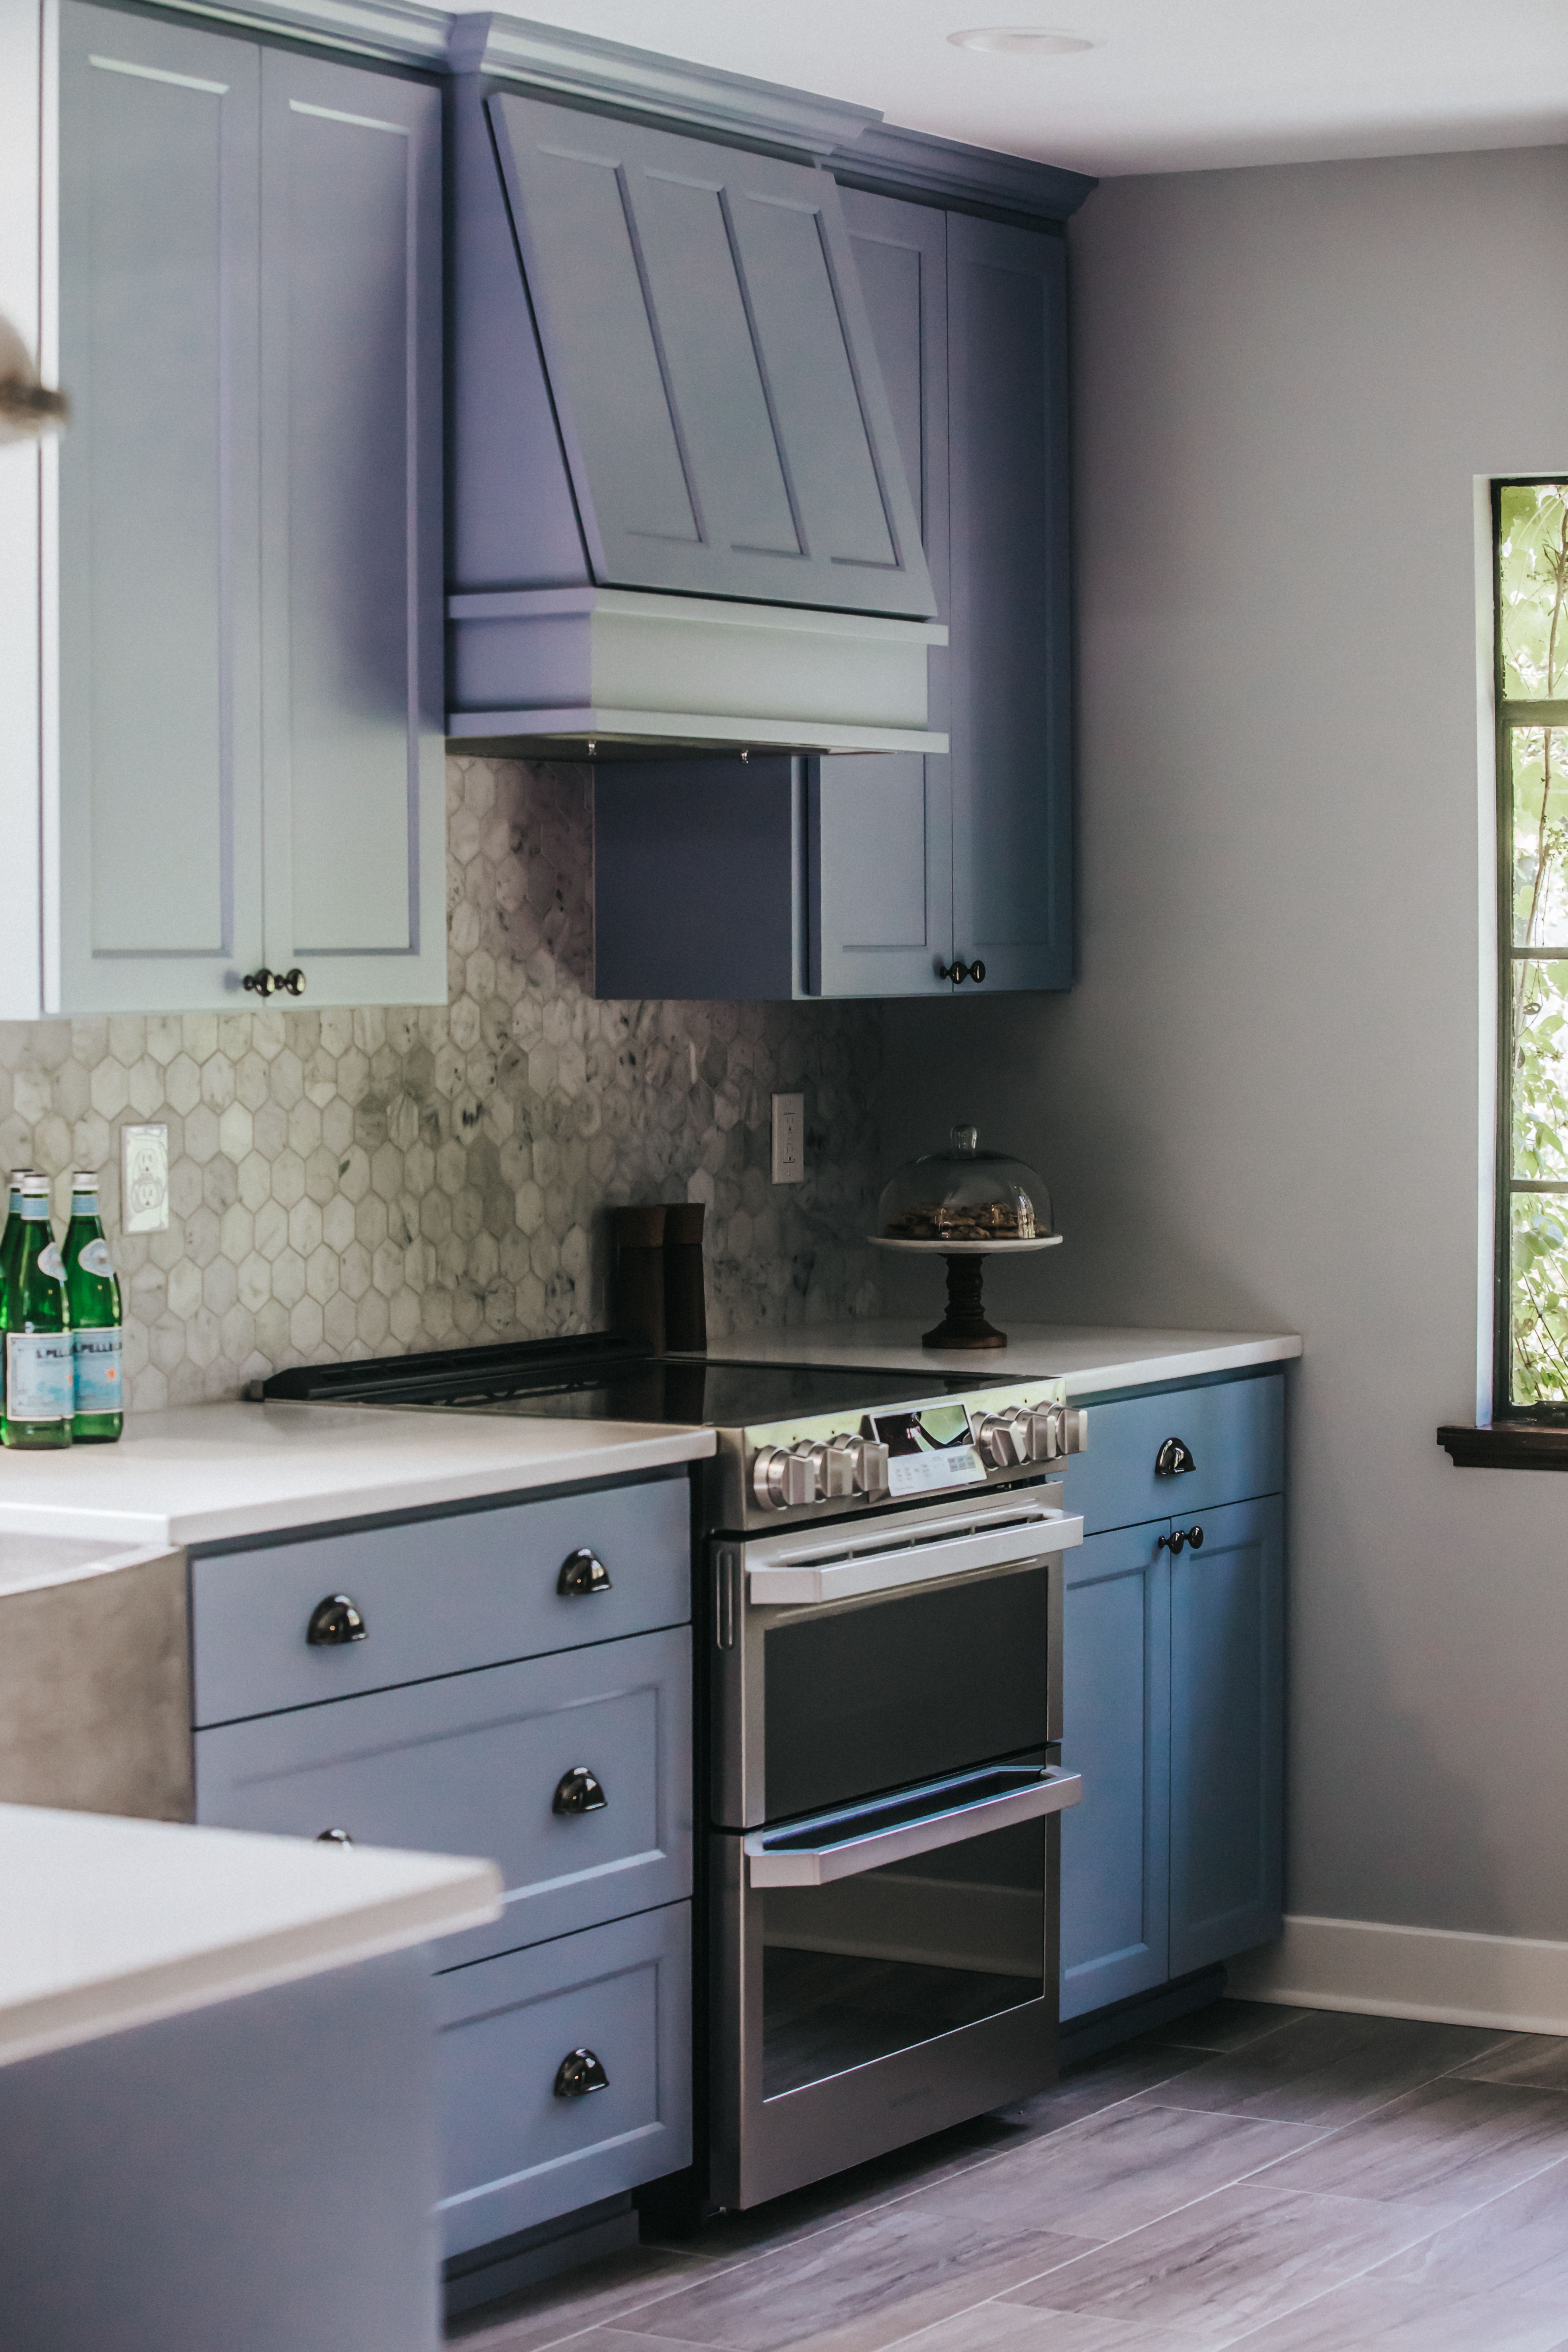 Kitchen Cabinets Spokane Custom Cabinets with Custom hood | Best kitchen cabinets, Modern